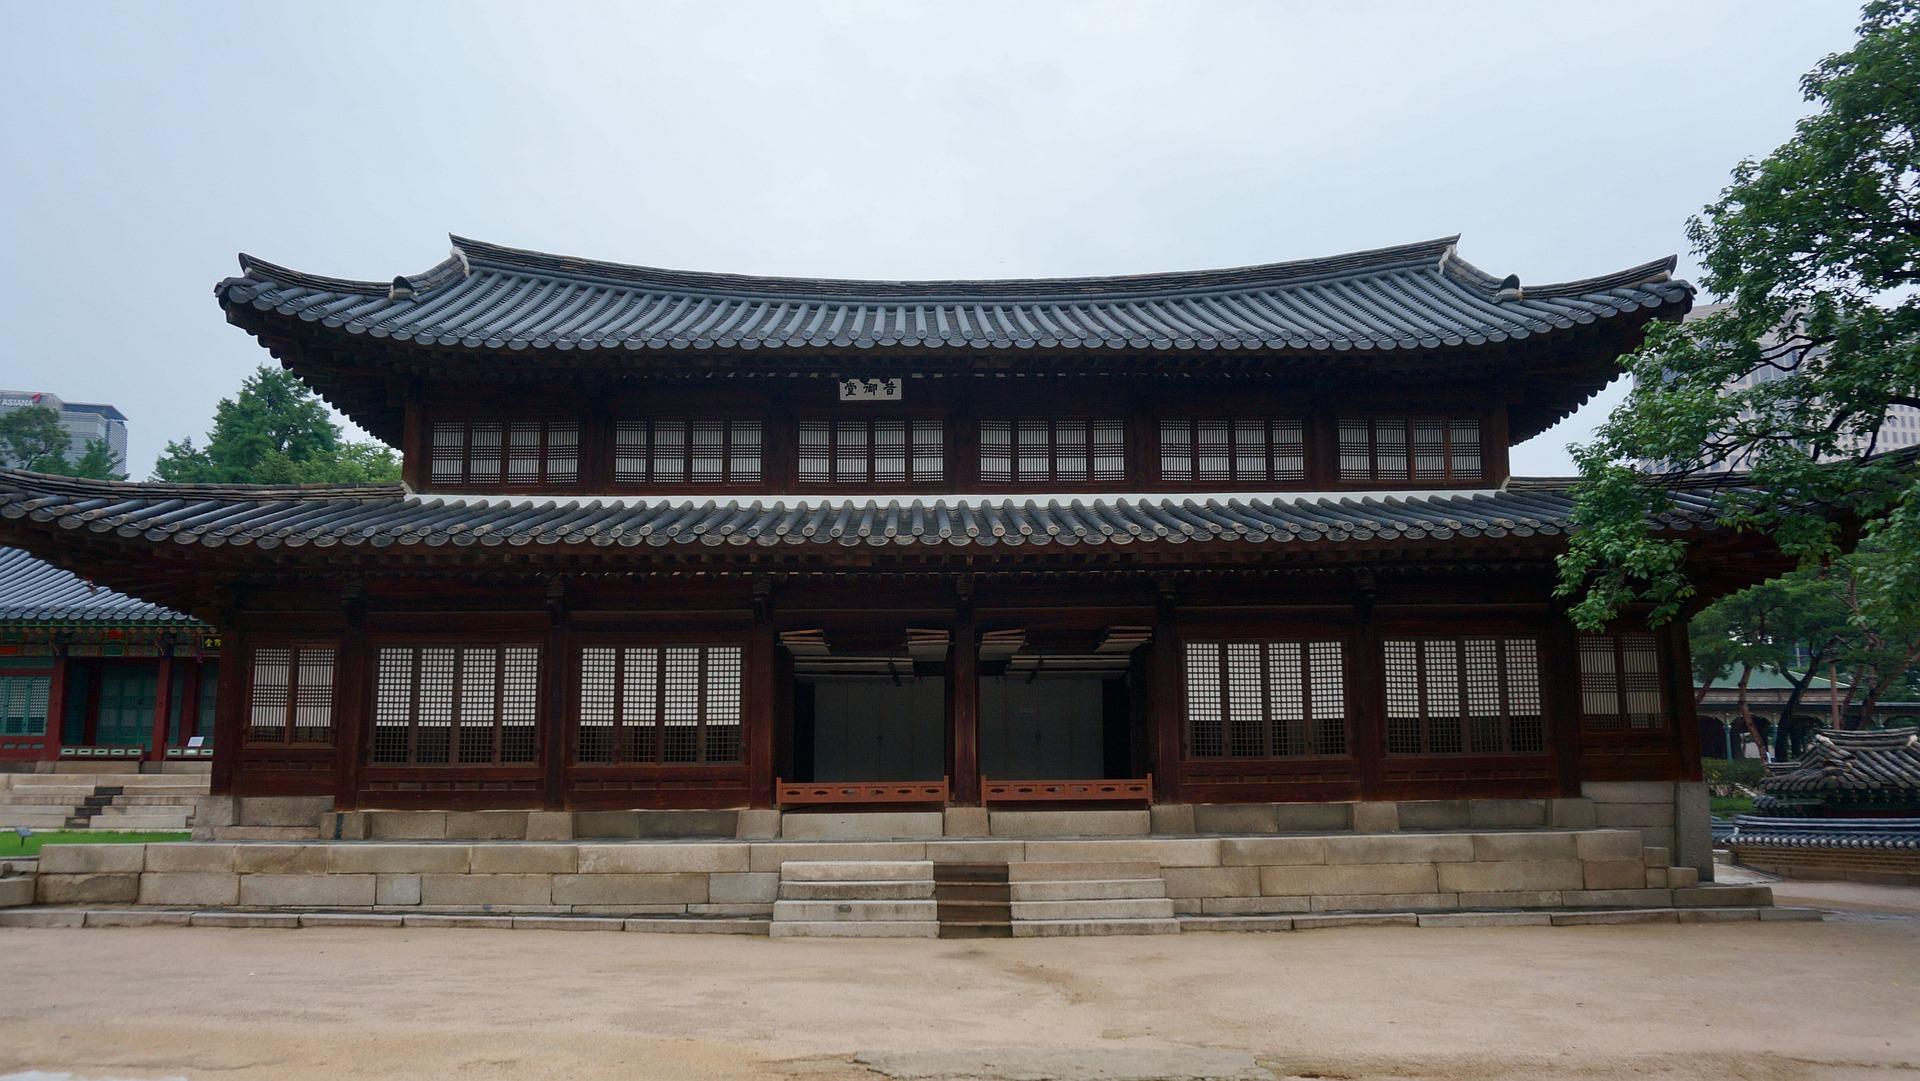 South Korea landmark building